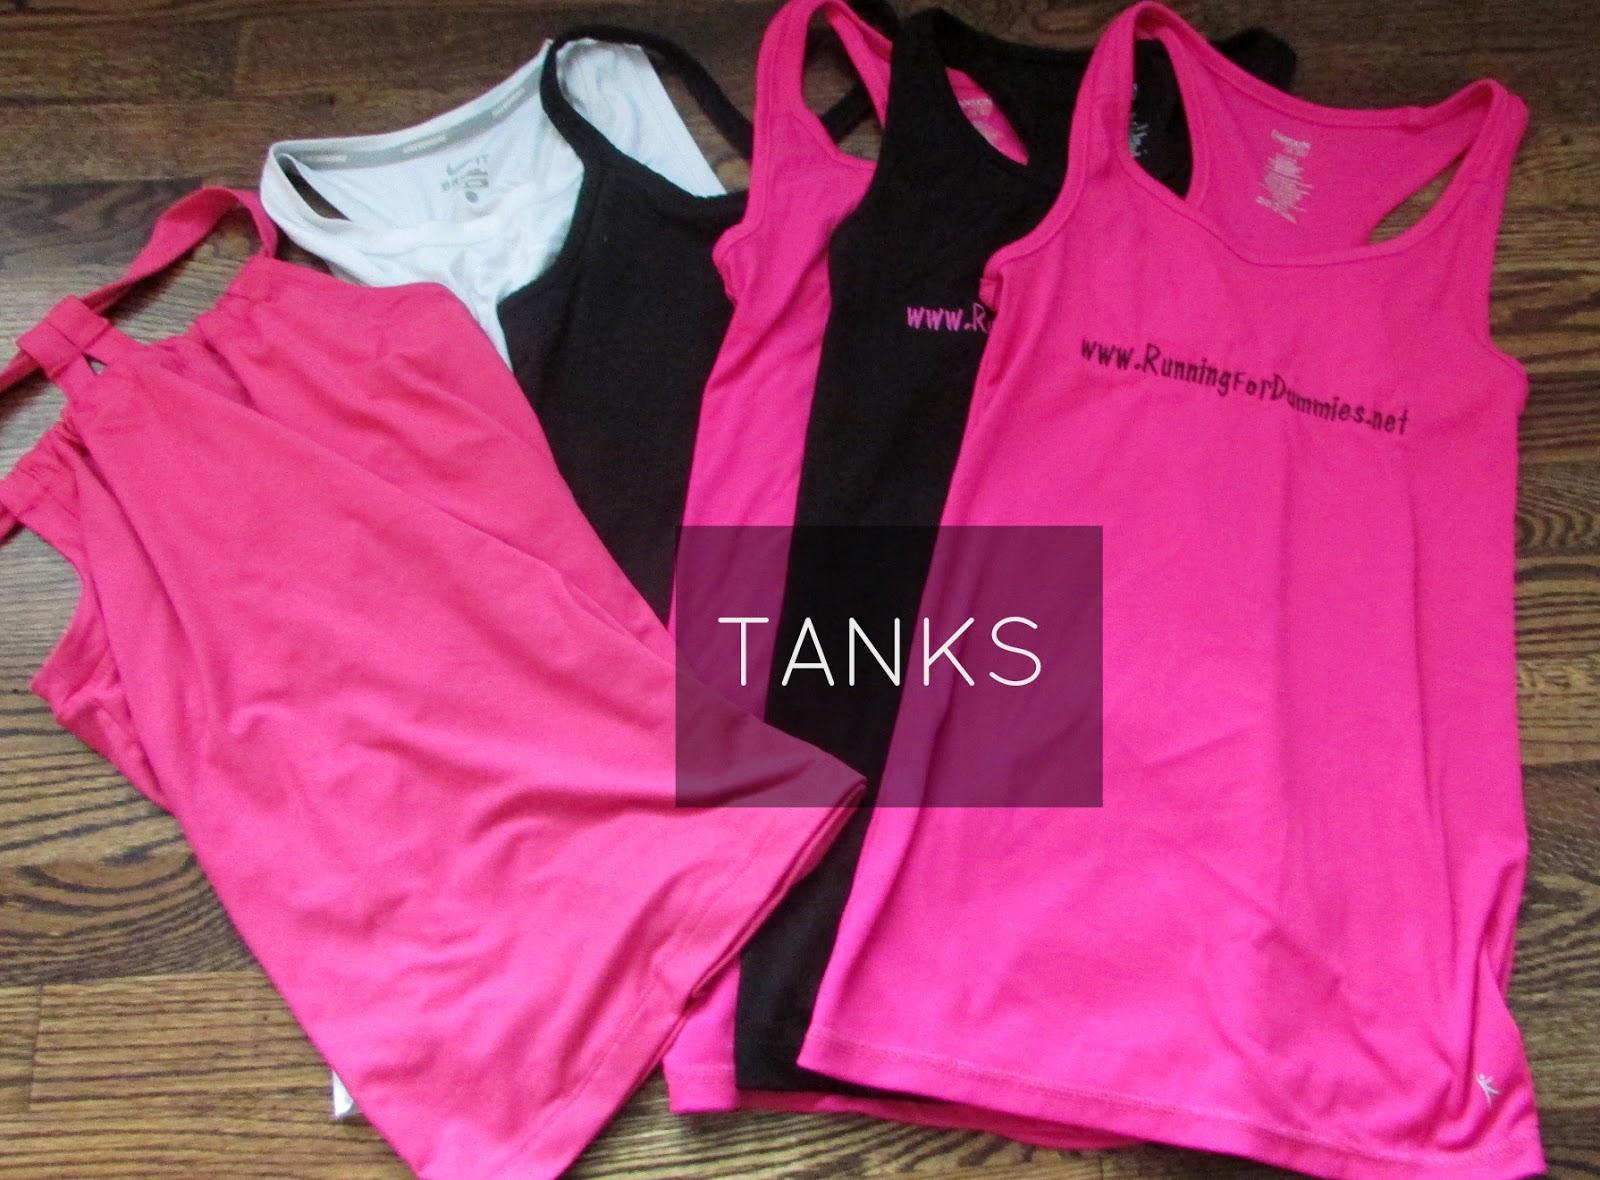 da09ce20677 Personalized Running Shirts Nike